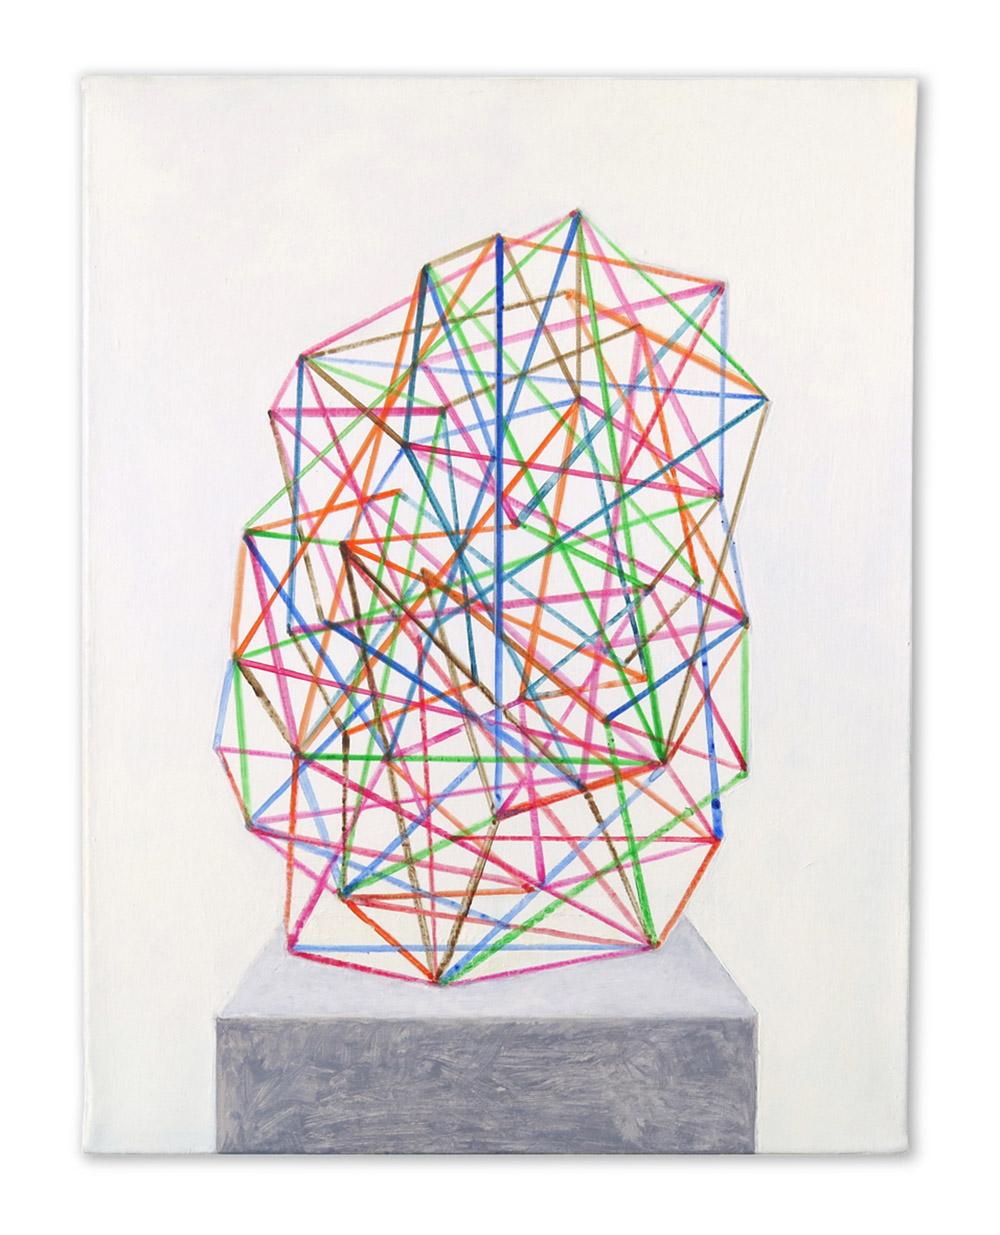 Sculpture abstraite. Acrylic on linen, 35 x 27 cm